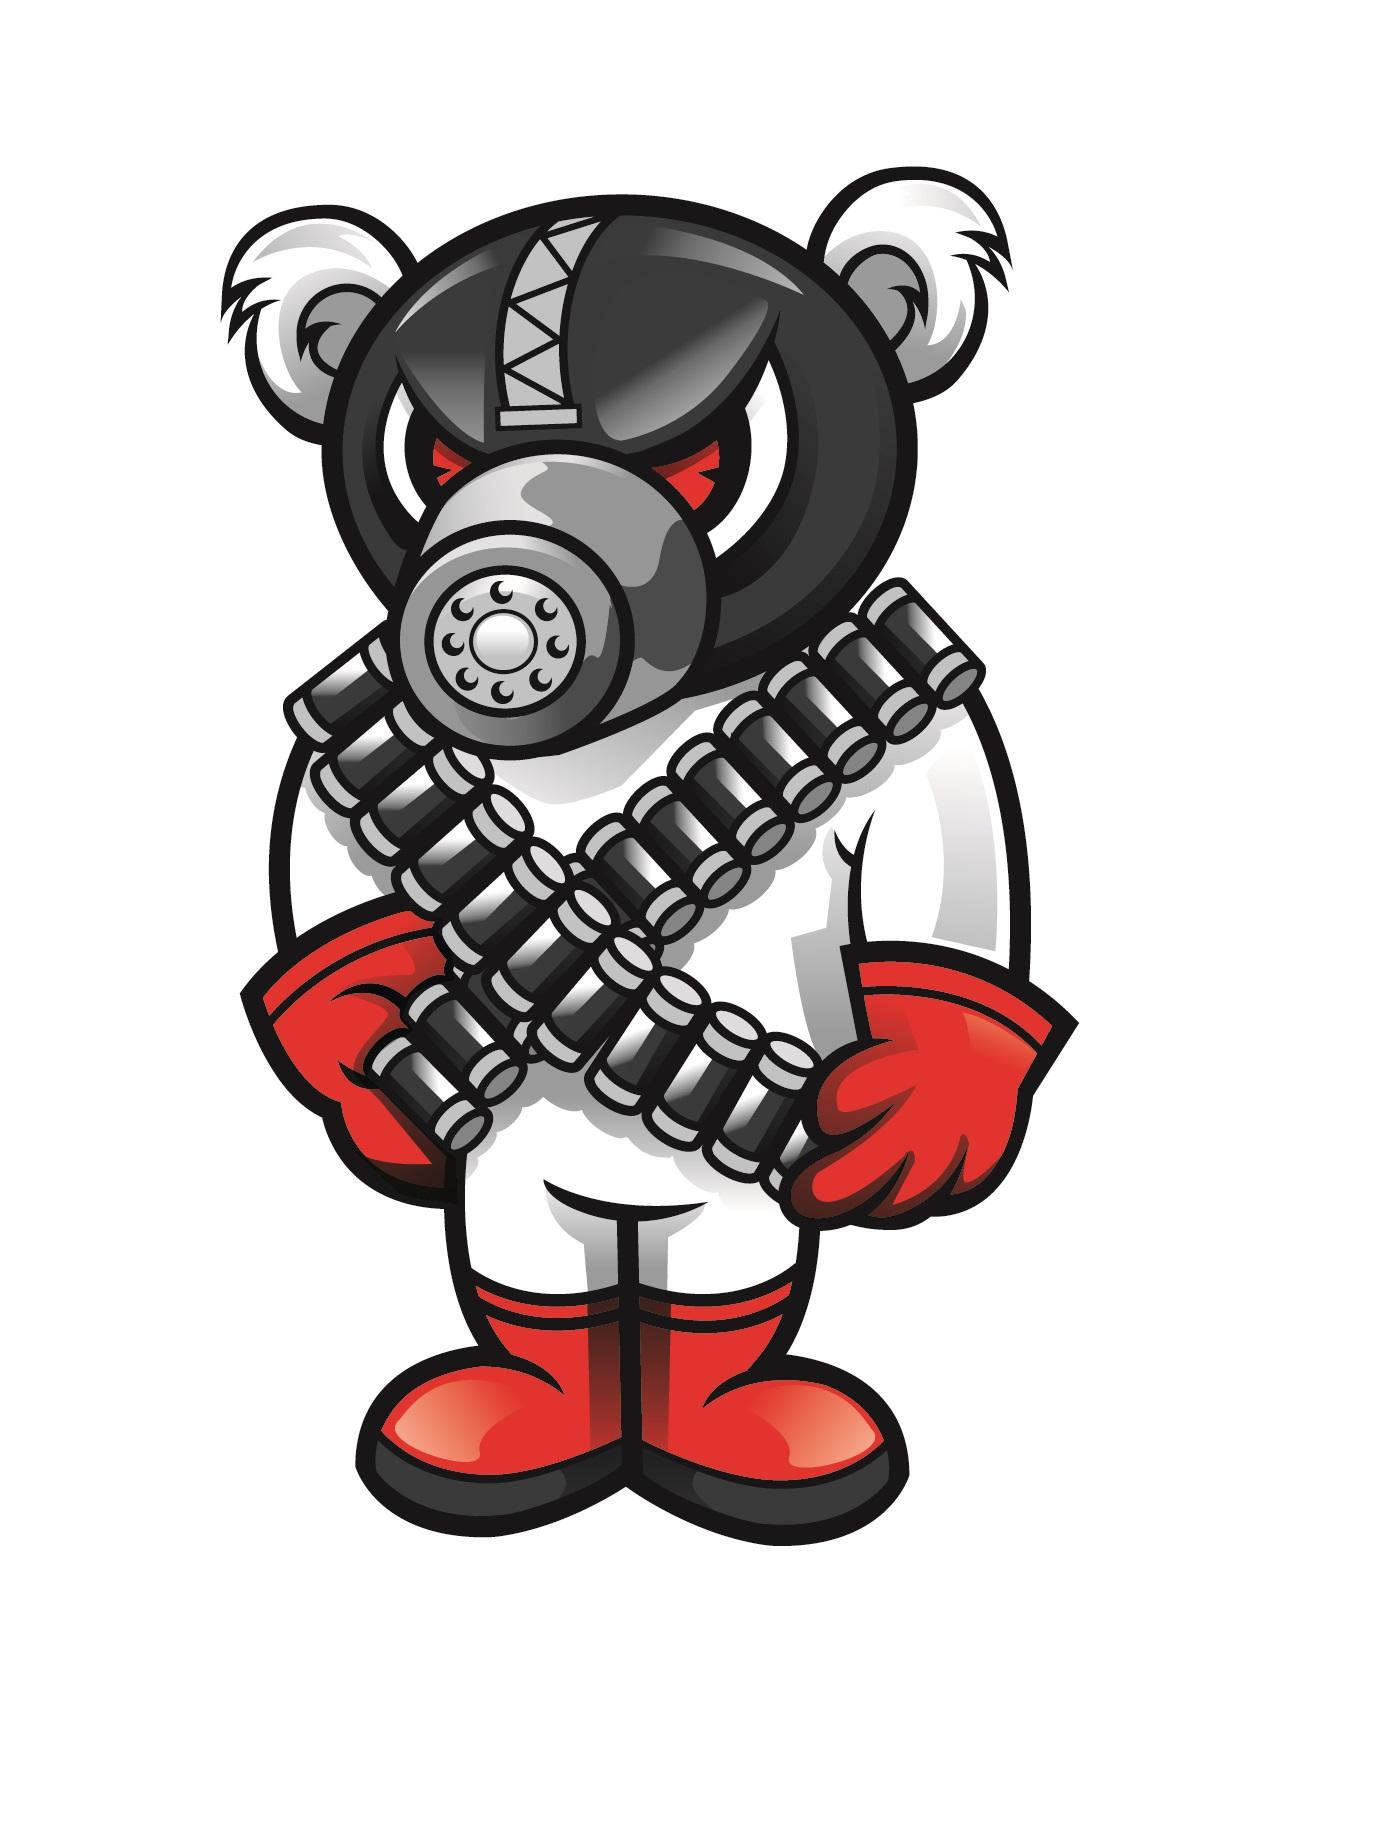 Nuker Mascot